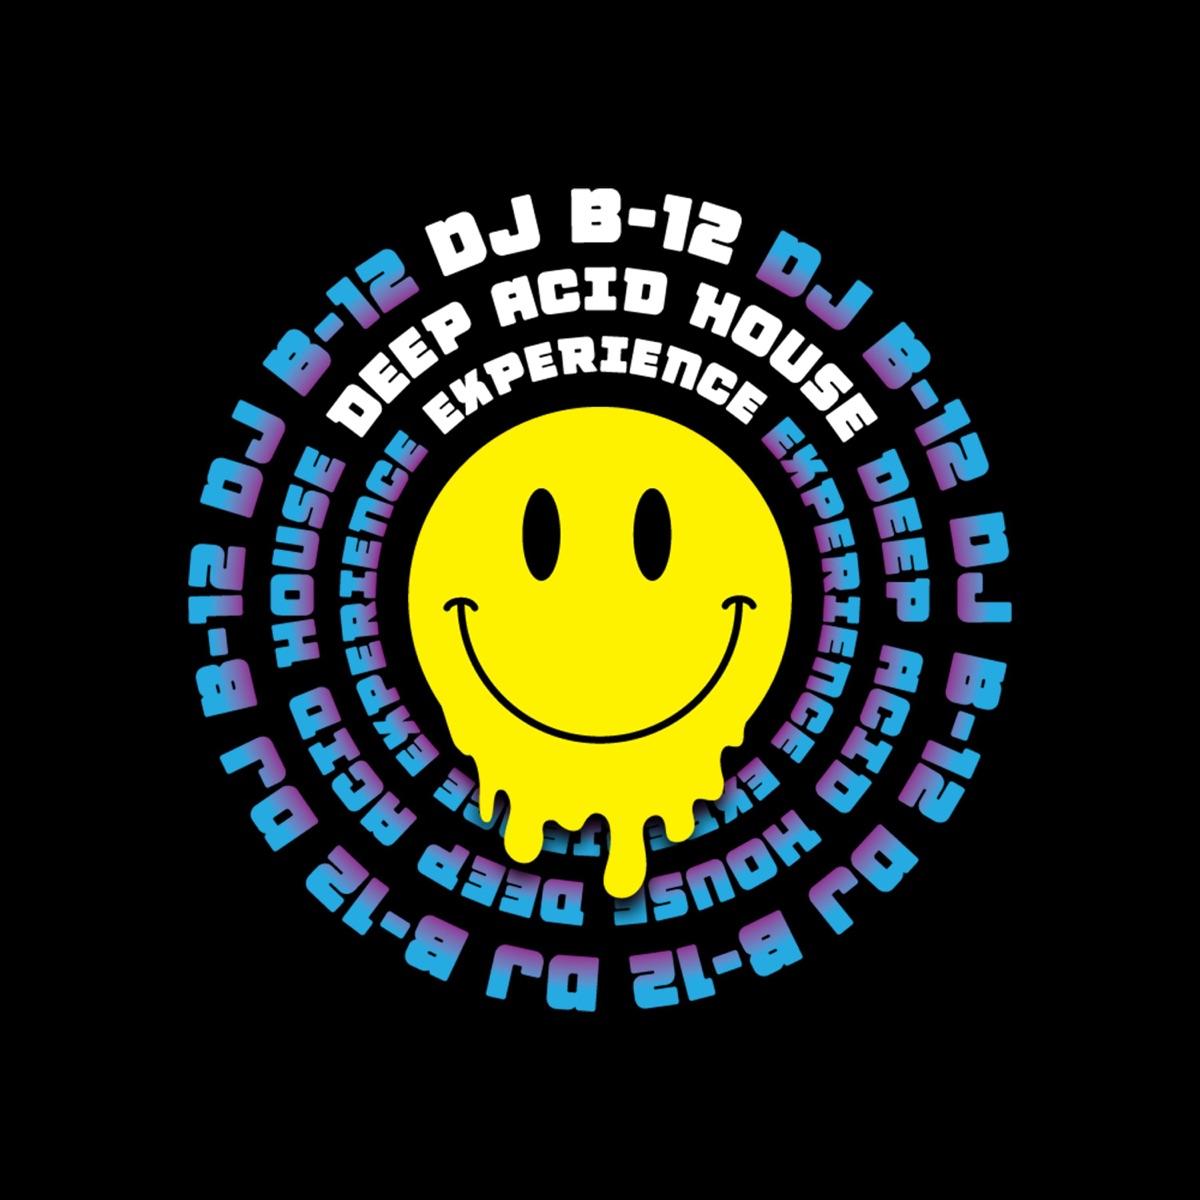 DJ B-12 Deep Acid House Experience